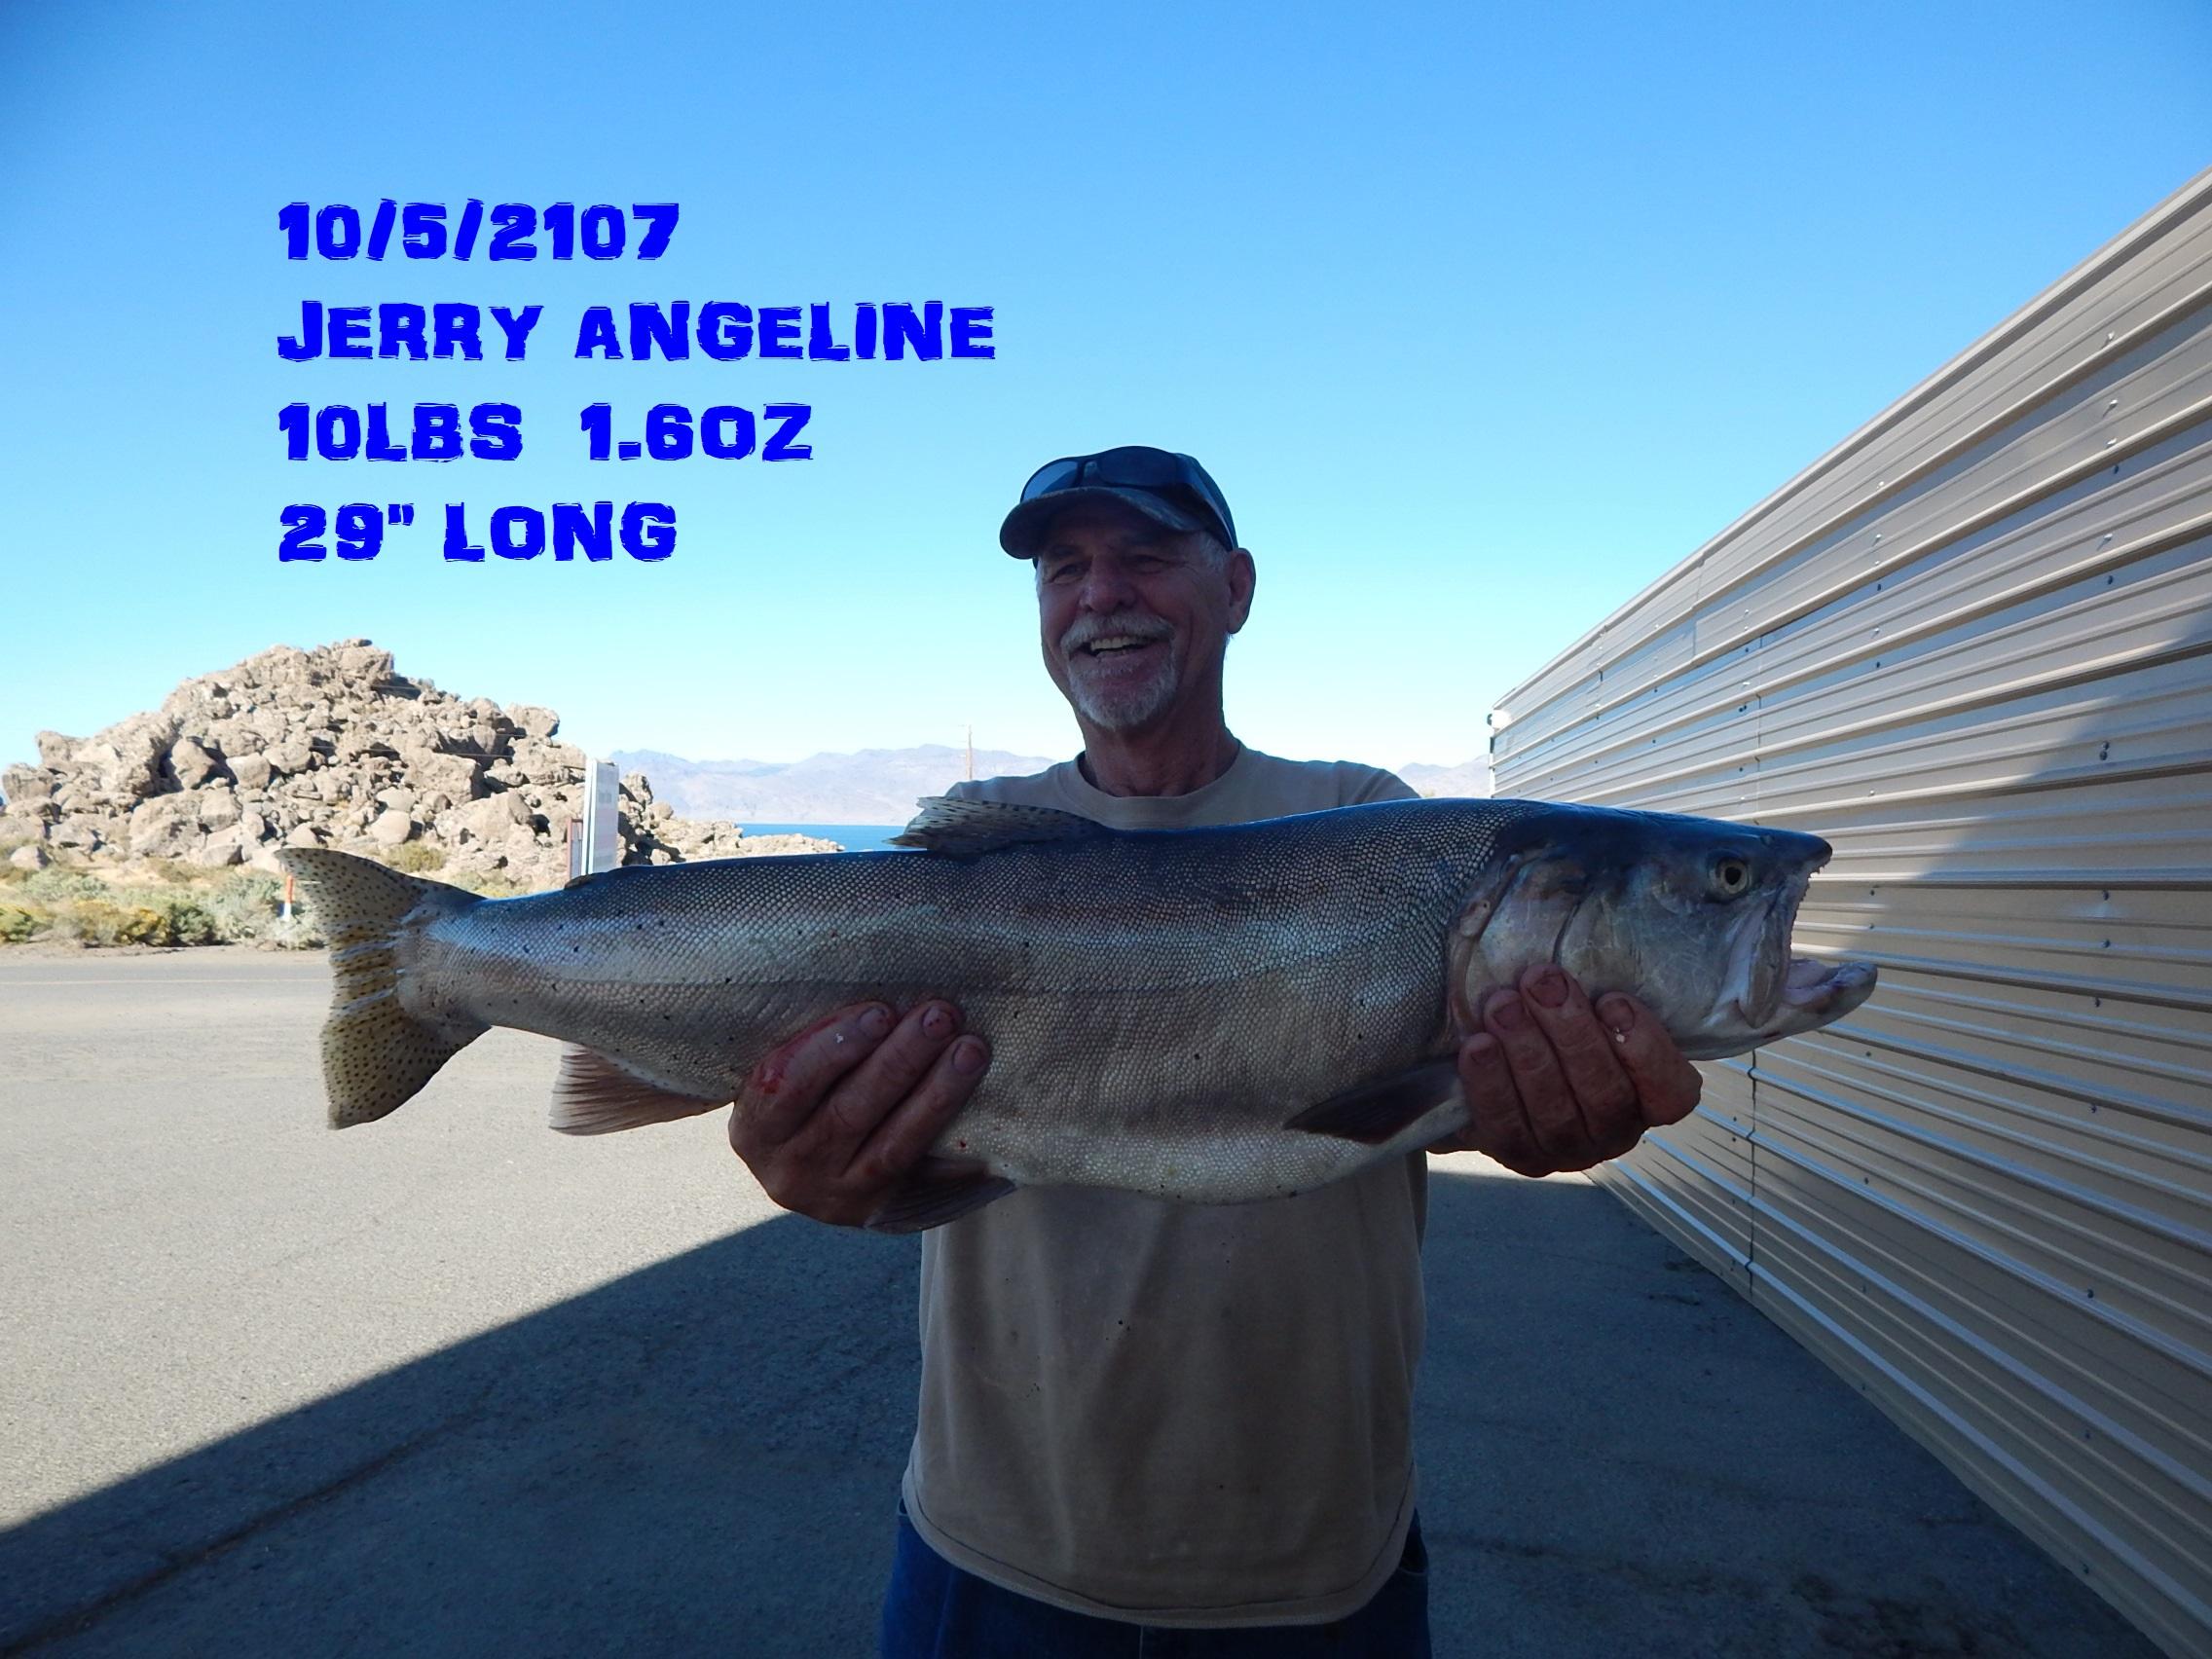 JERRY ANGELINE 10-5-17.jpg